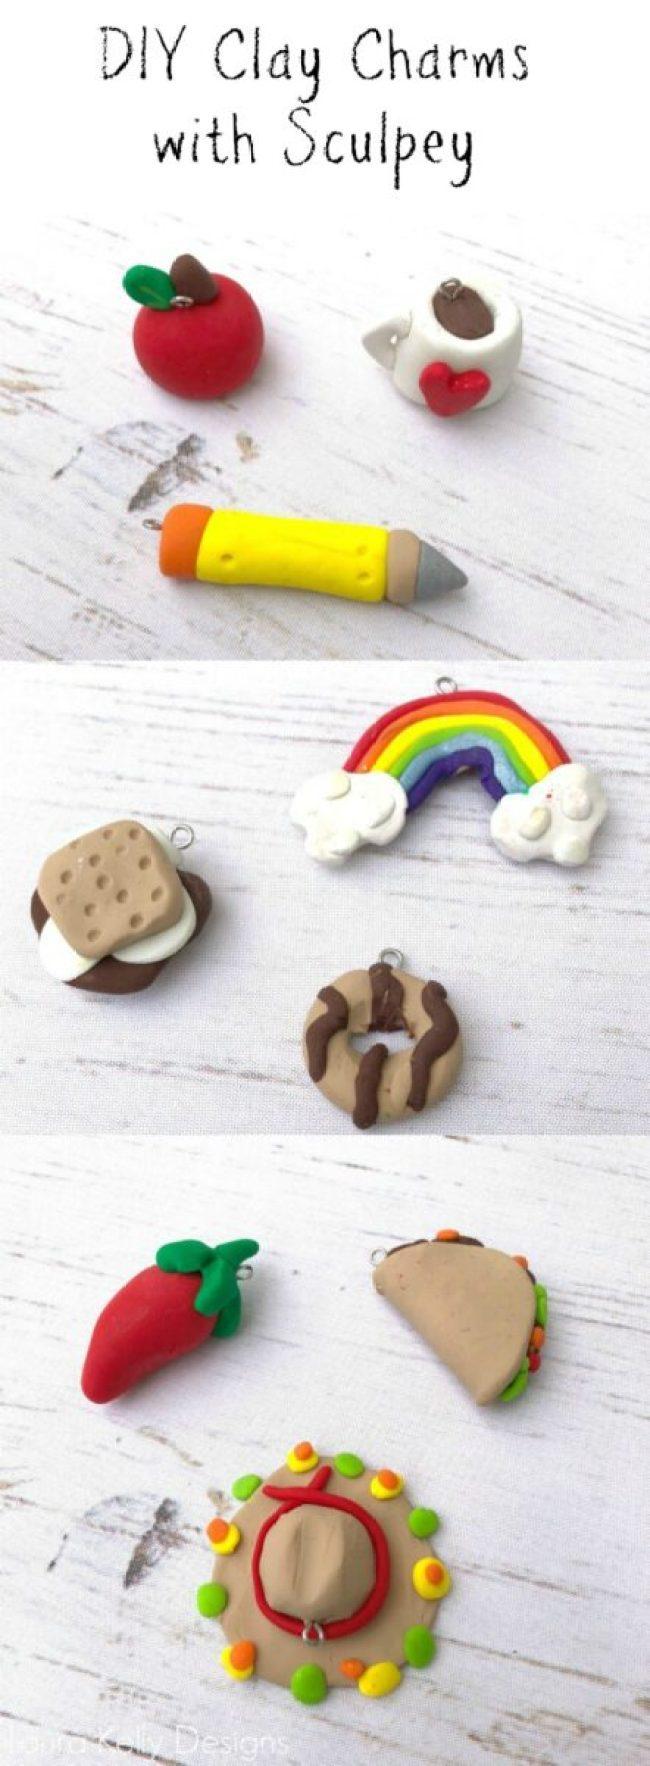 Clay Charms with Bake Shop Clay DIY #kidcraft #claycraft #claybugs